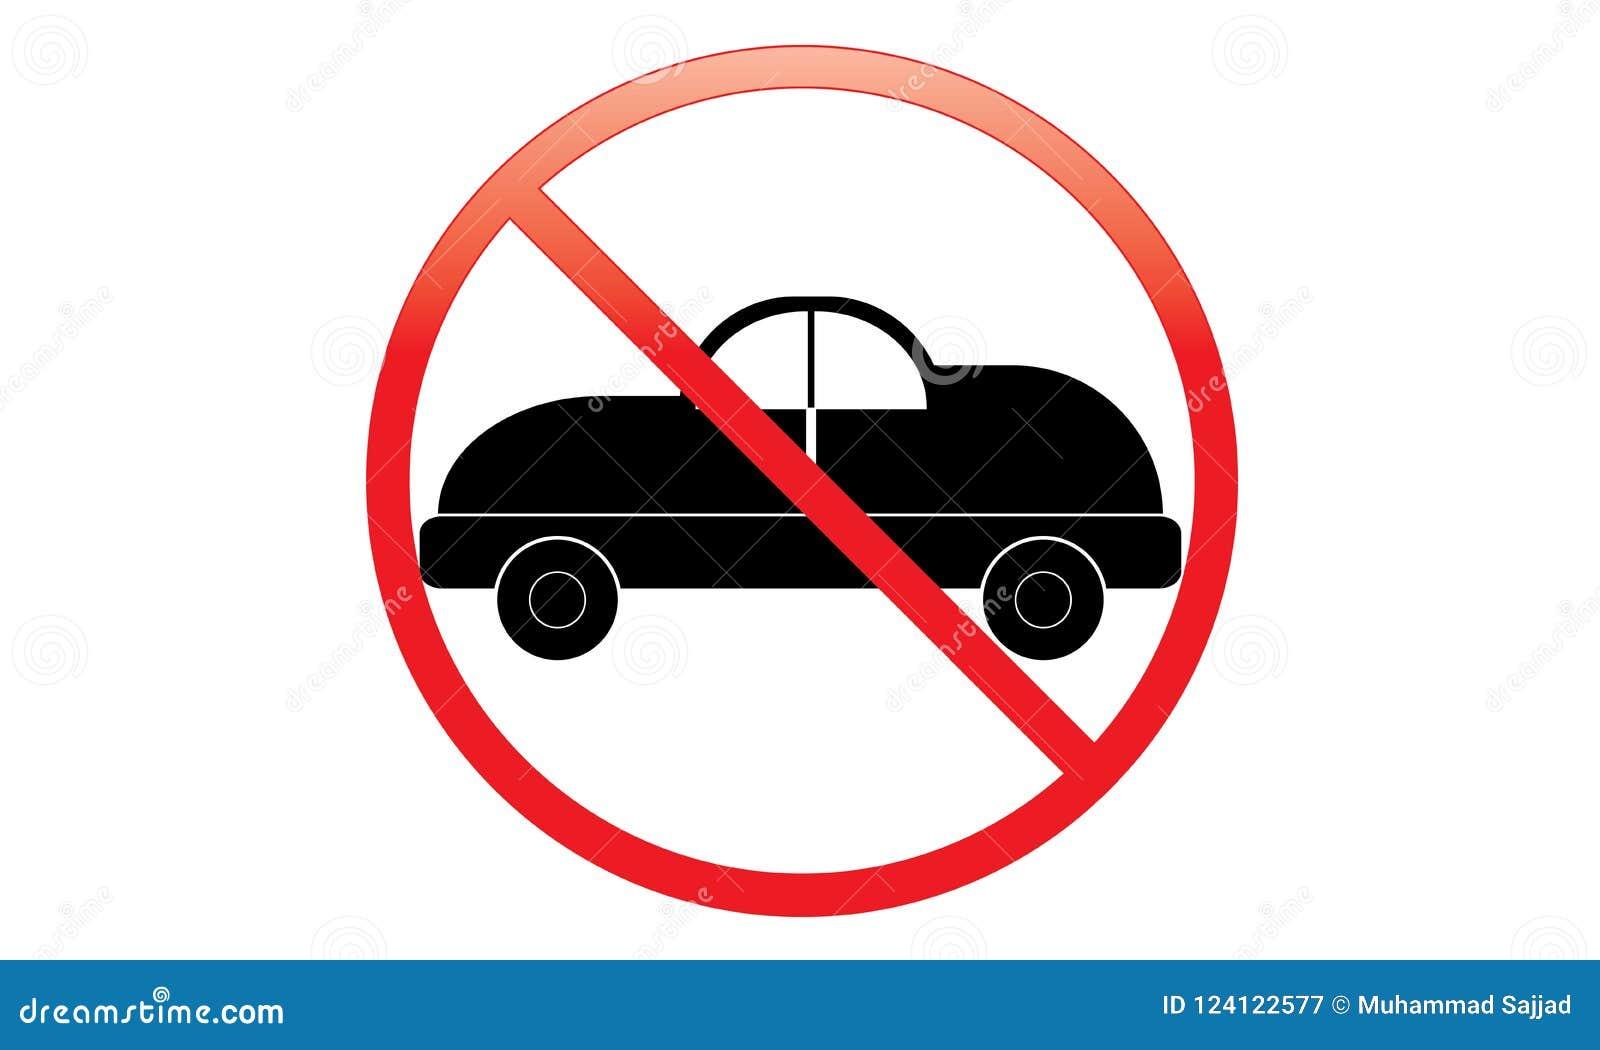 Keine Auto-Ikone - Parkverbot Van Symbol - kein reisendes Fahrzeug - Parkverbot-Automobilikone, lokalisiert Flaches Design